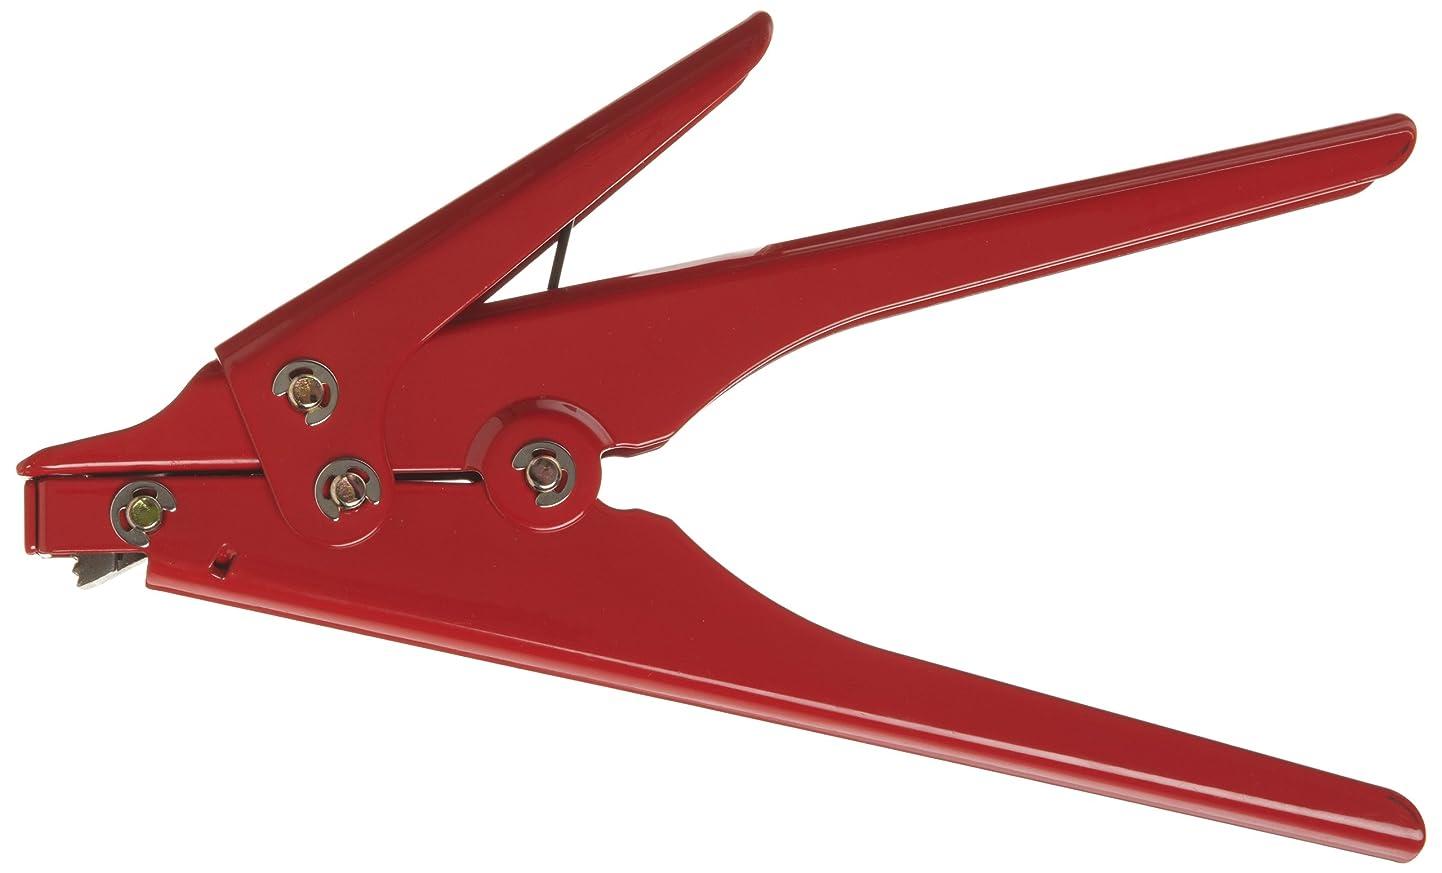 Morris Products 50240 Metal Cable Tie Gun Wide Ties, All Metal Casing, 0.370 Inches Max Tie Width gyjuujmismj9